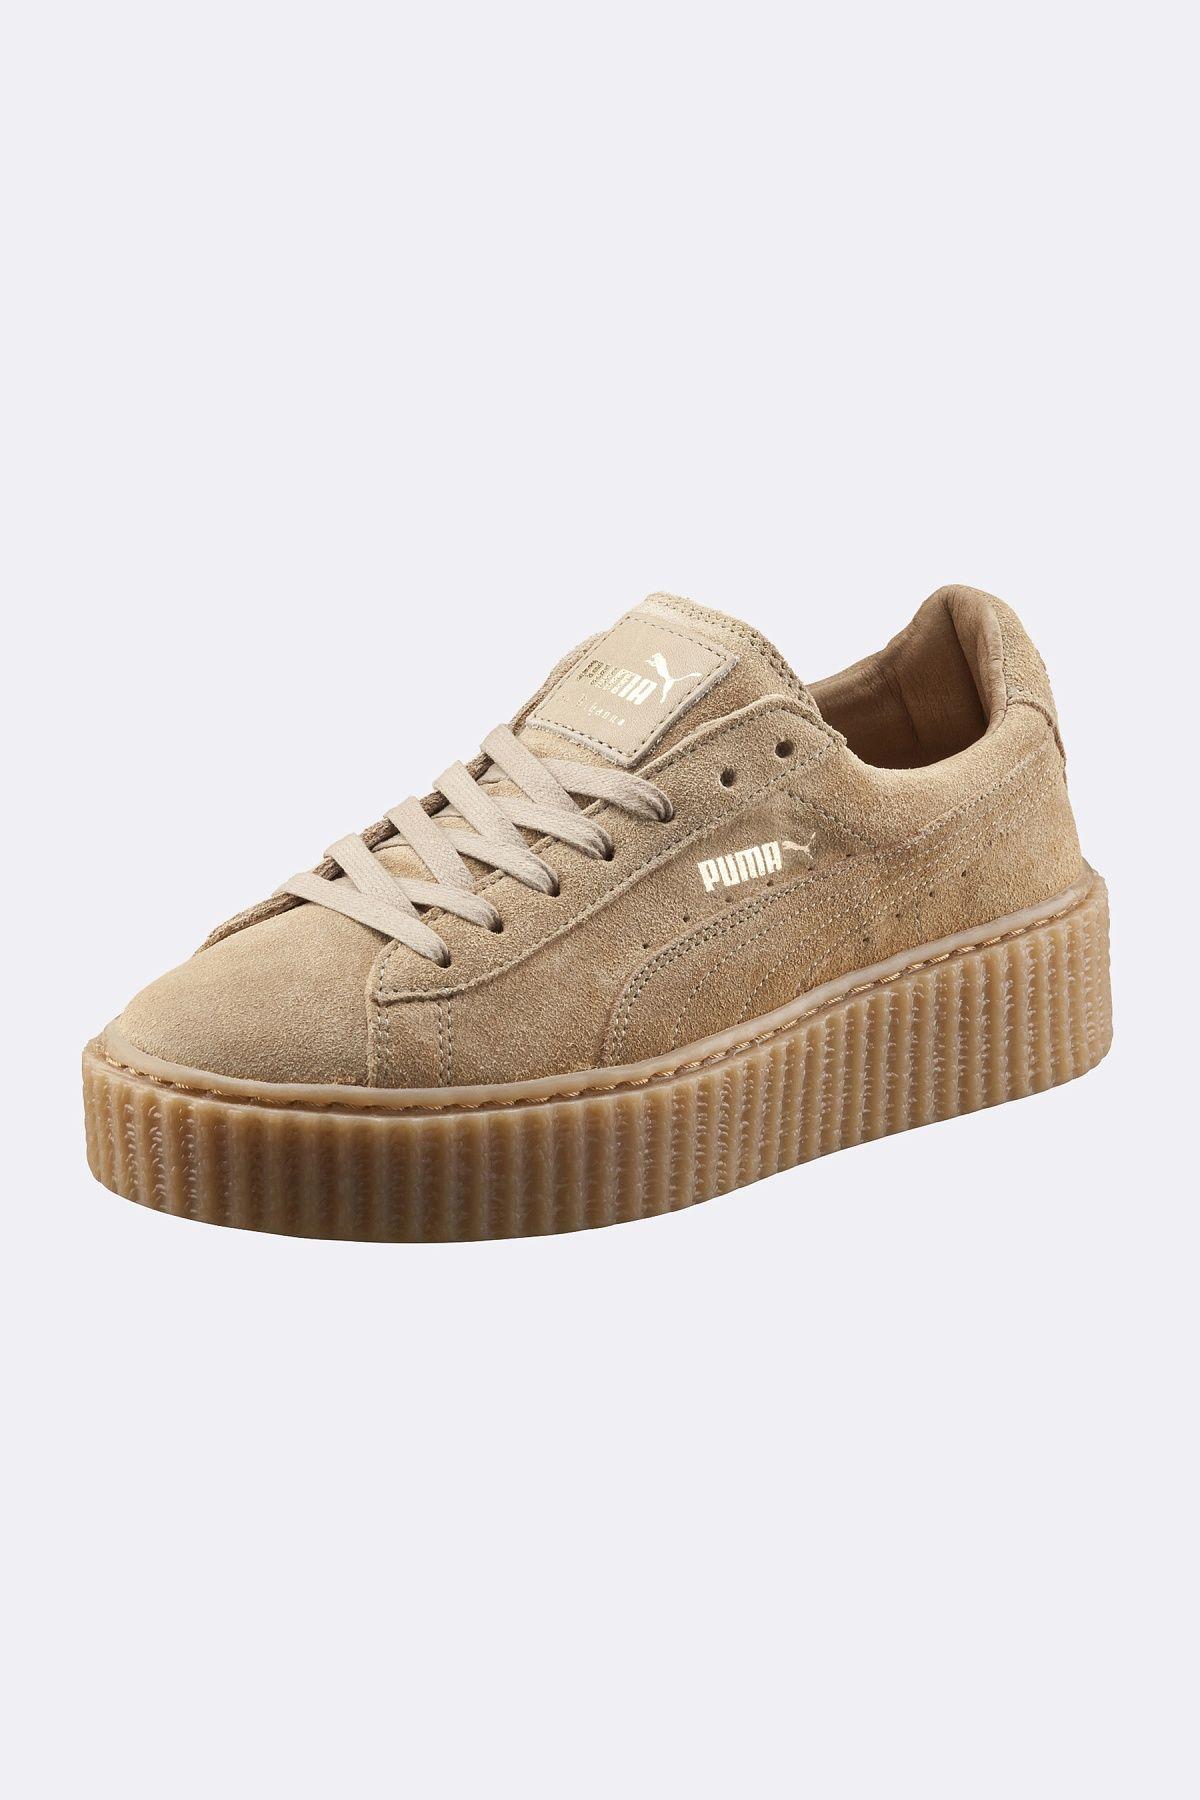 e76b4adfacc84 Каталог in 2019 | ☆ Sneakers ☆ | Унисекс, Кроссовки, Женская обувь